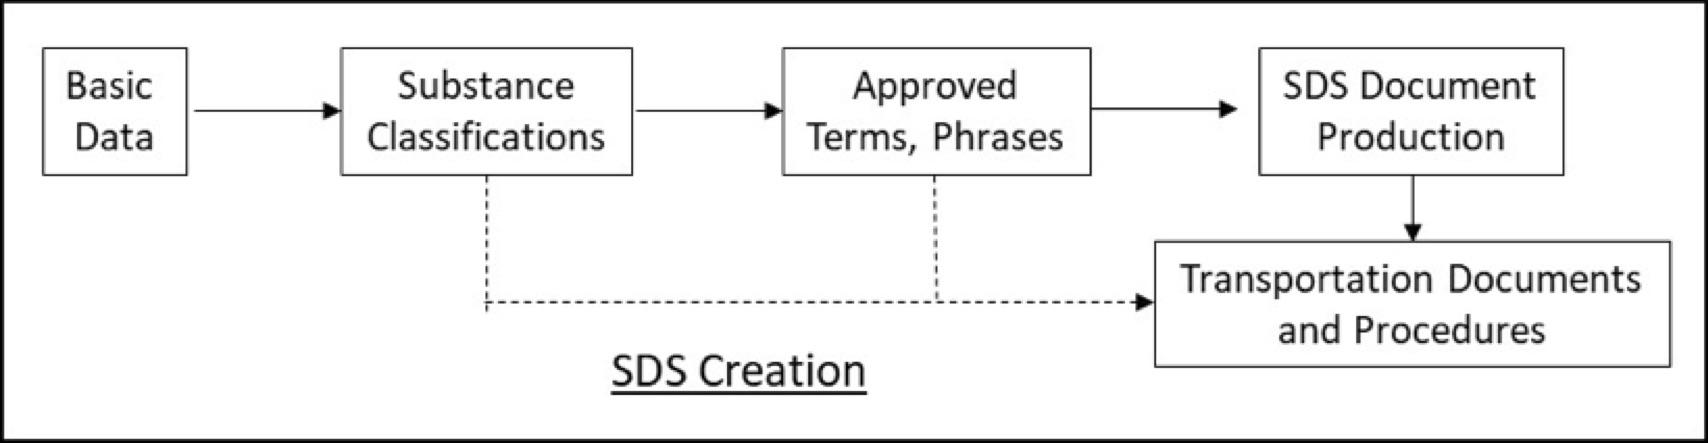 creating an sds